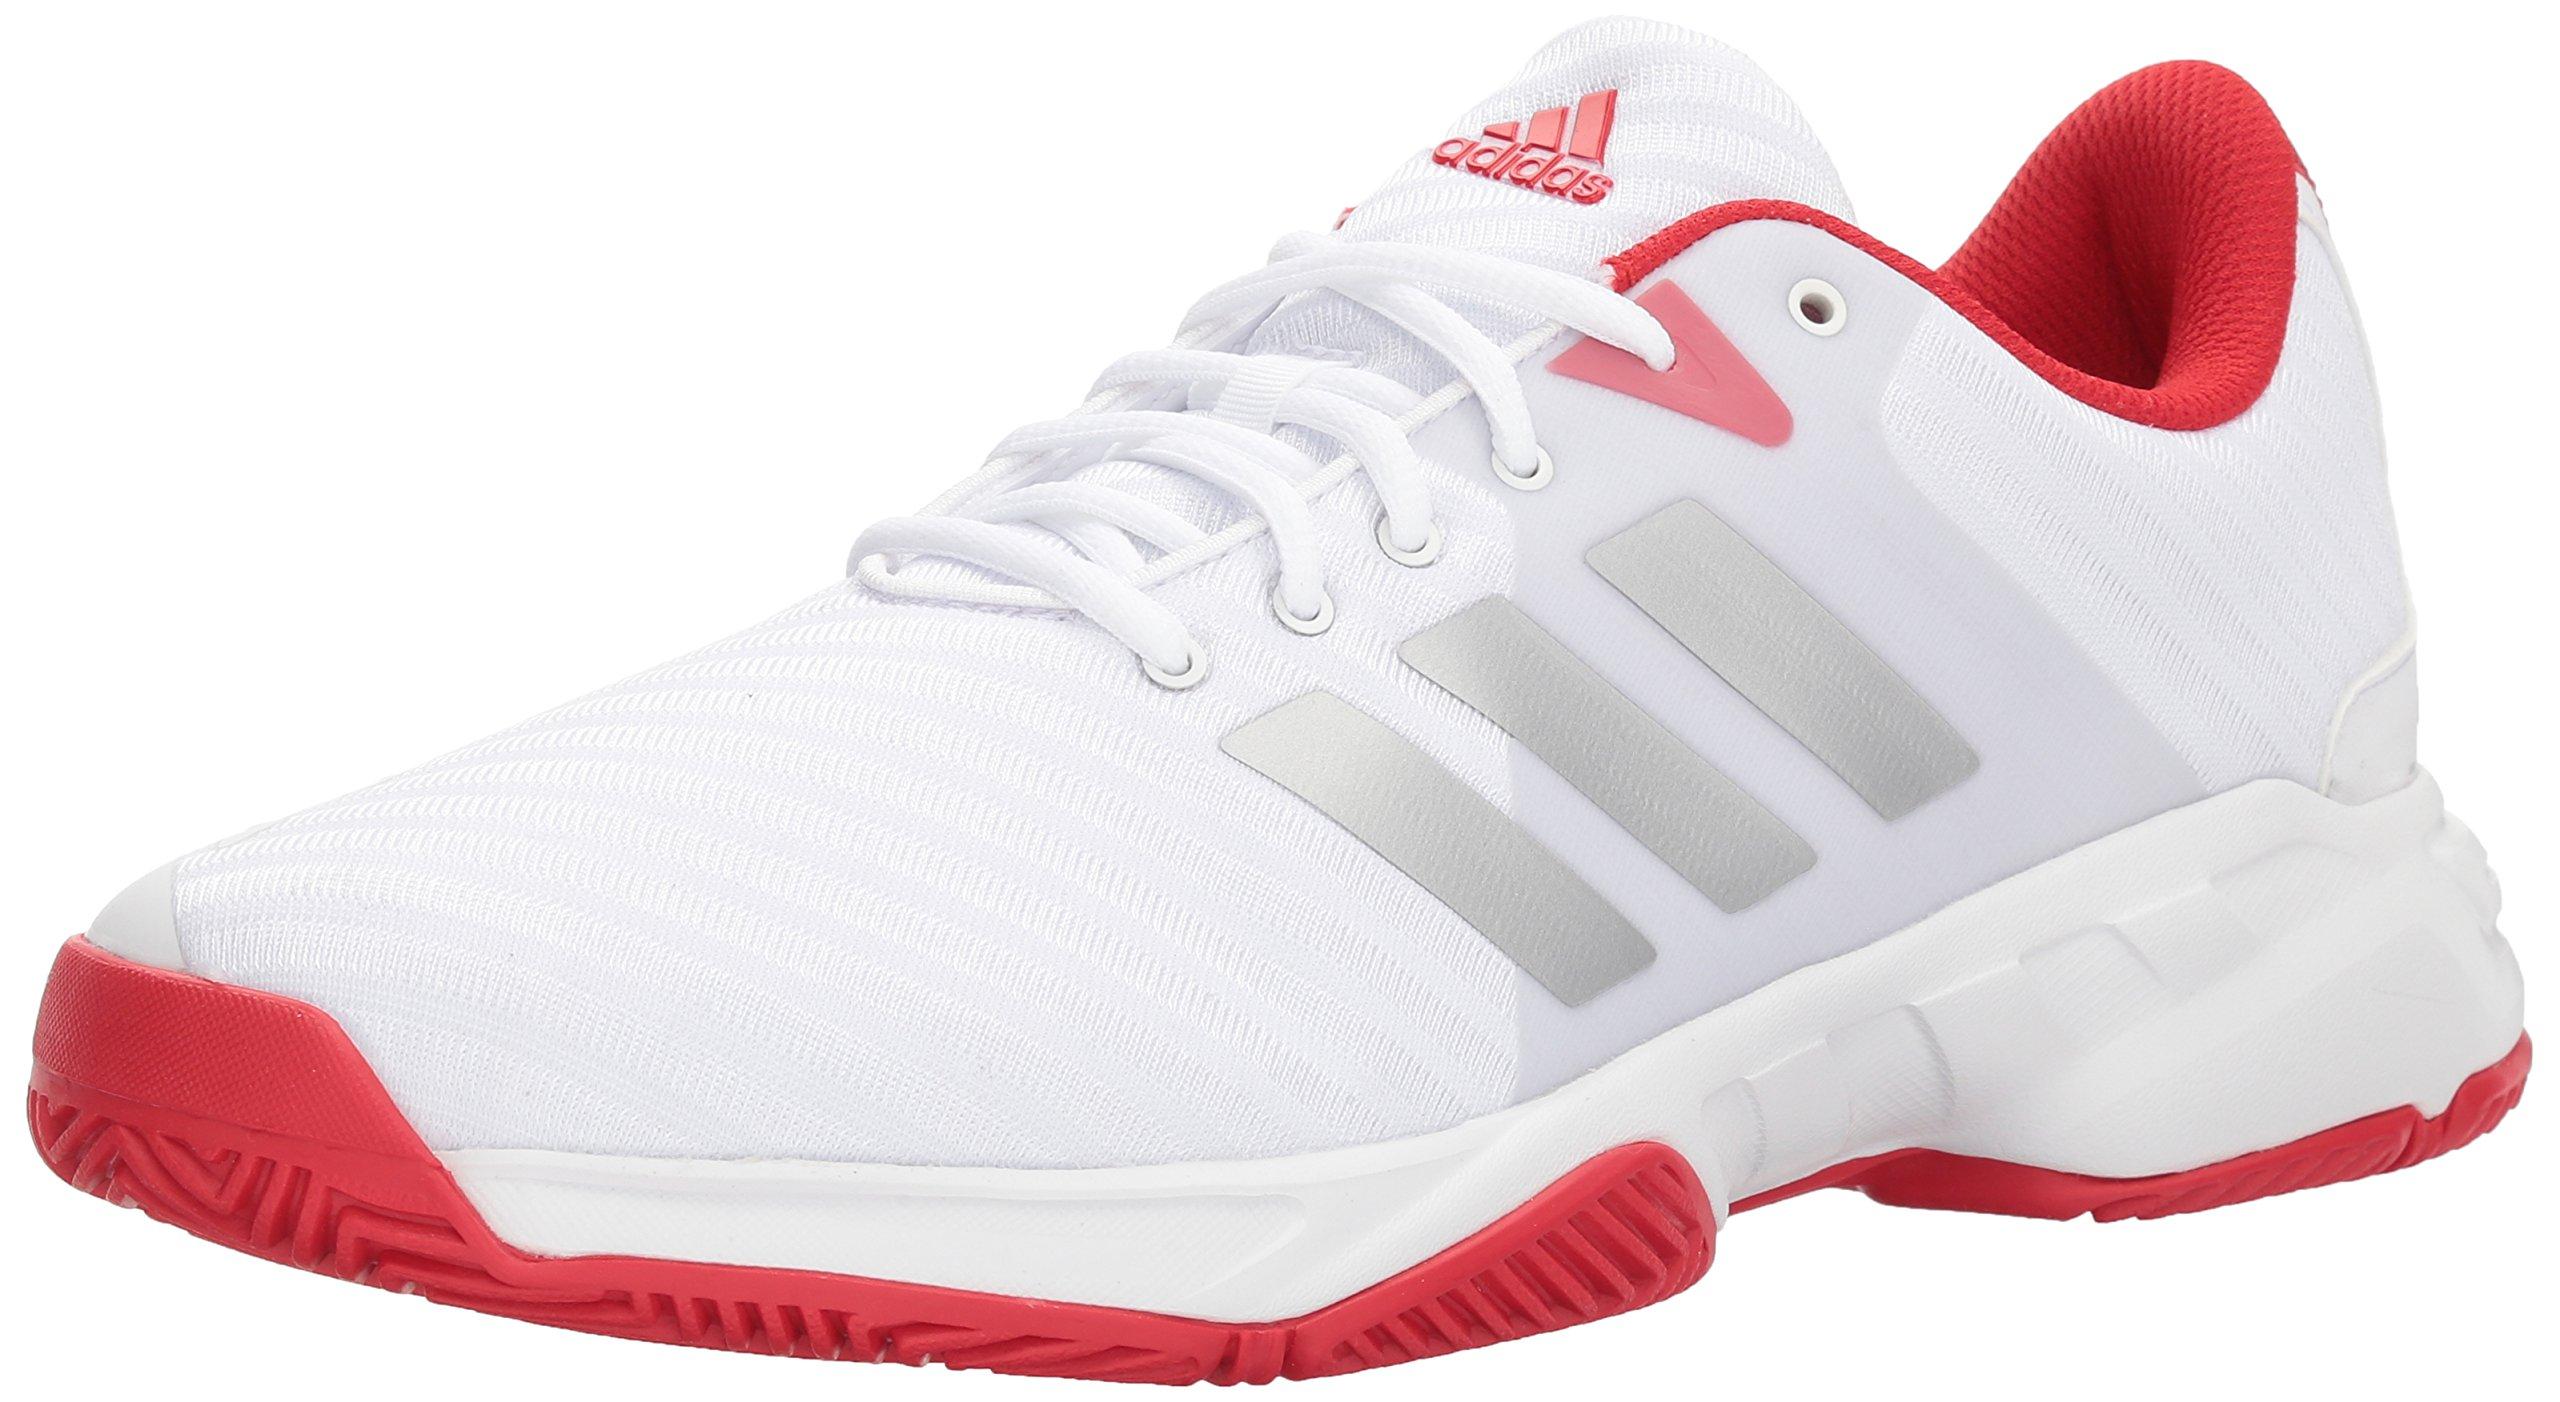 adidas Performance Men's Barricade Court 3 Tennis Shoe, White/Matte Silver/Scarlet, 9.5 M US